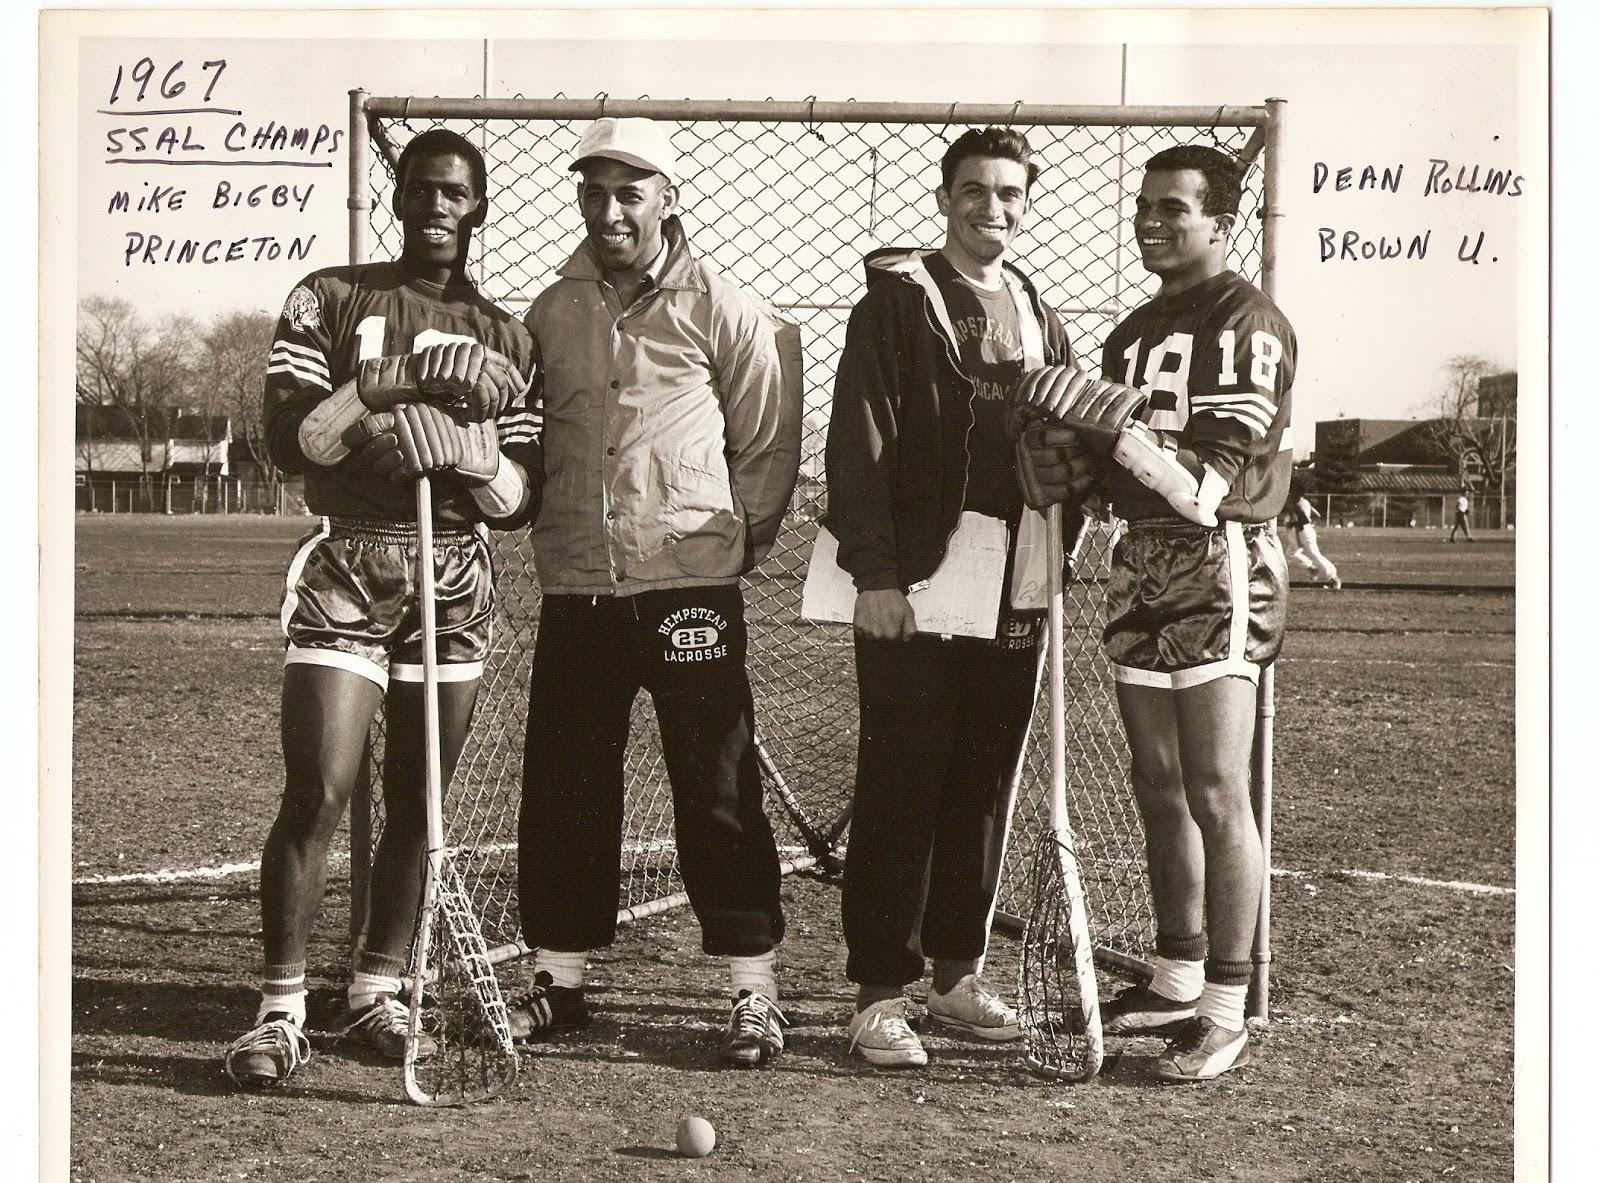 http://4.bp.blogspot.com/-MYvaIt8u36I/UOWeac1HUoI/AAAAAAAADe8/ZxL1aOLEbbI/s1600/Mike+Bigby+princeton,+Coach+Hank+Lunde,++and+Dean+Rollins+Brown+University,+1967+SSAL+Champs.jpg